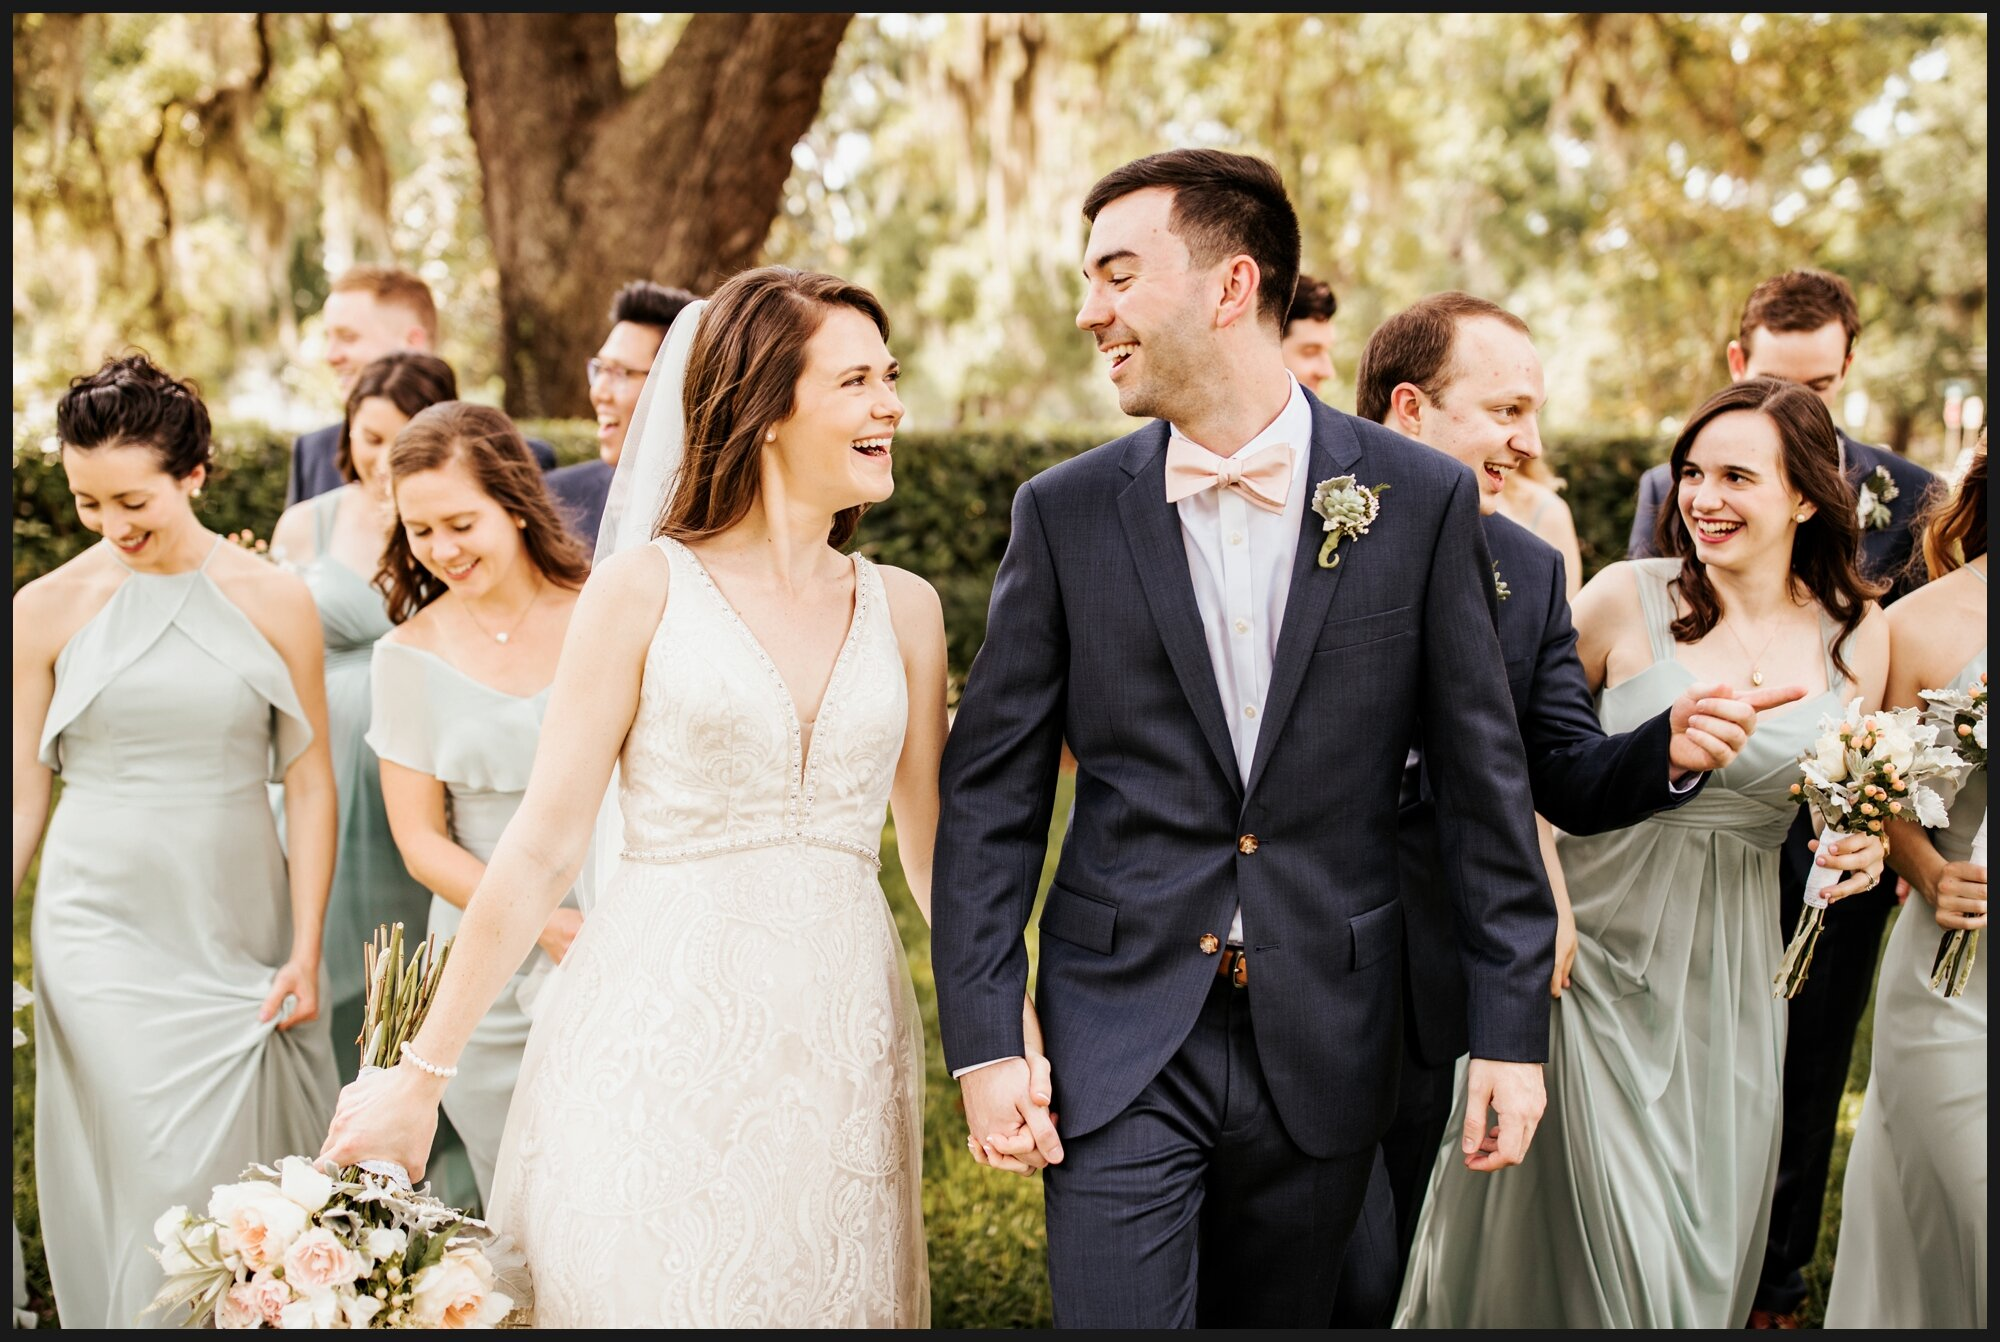 Orlando-Wedding-Photographer-destination-wedding-photographer-florida-wedding-photographer-hawaii-wedding-photographer_0671.jpg